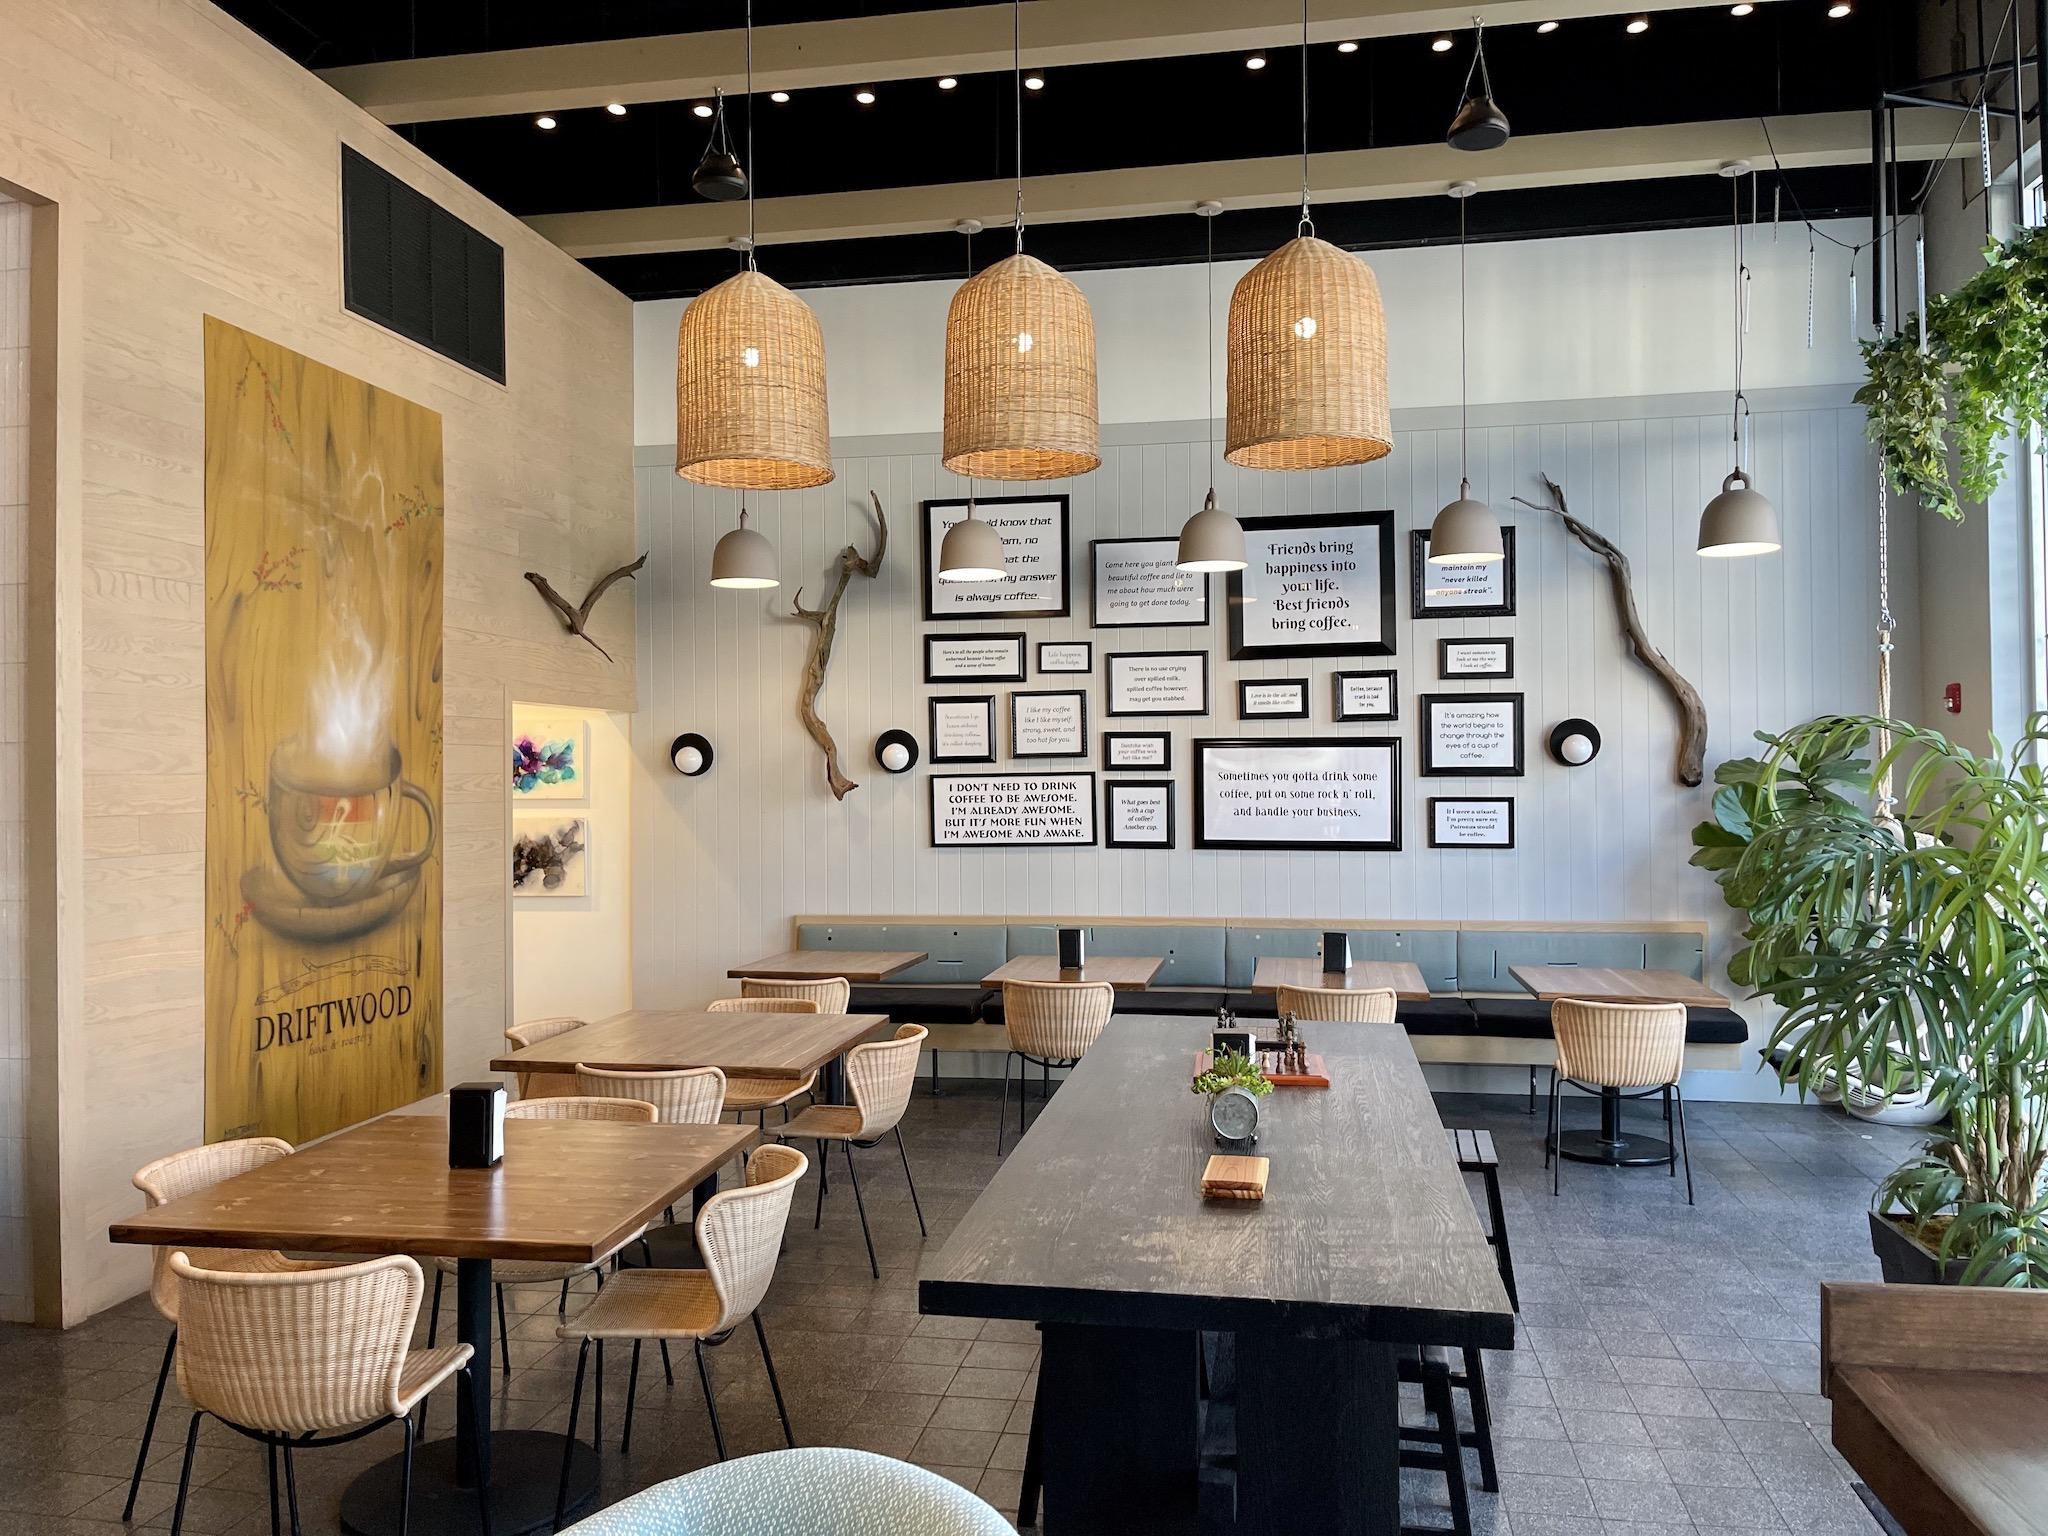 Driftwood Kava & Coffee Roastery - Rustic Interior